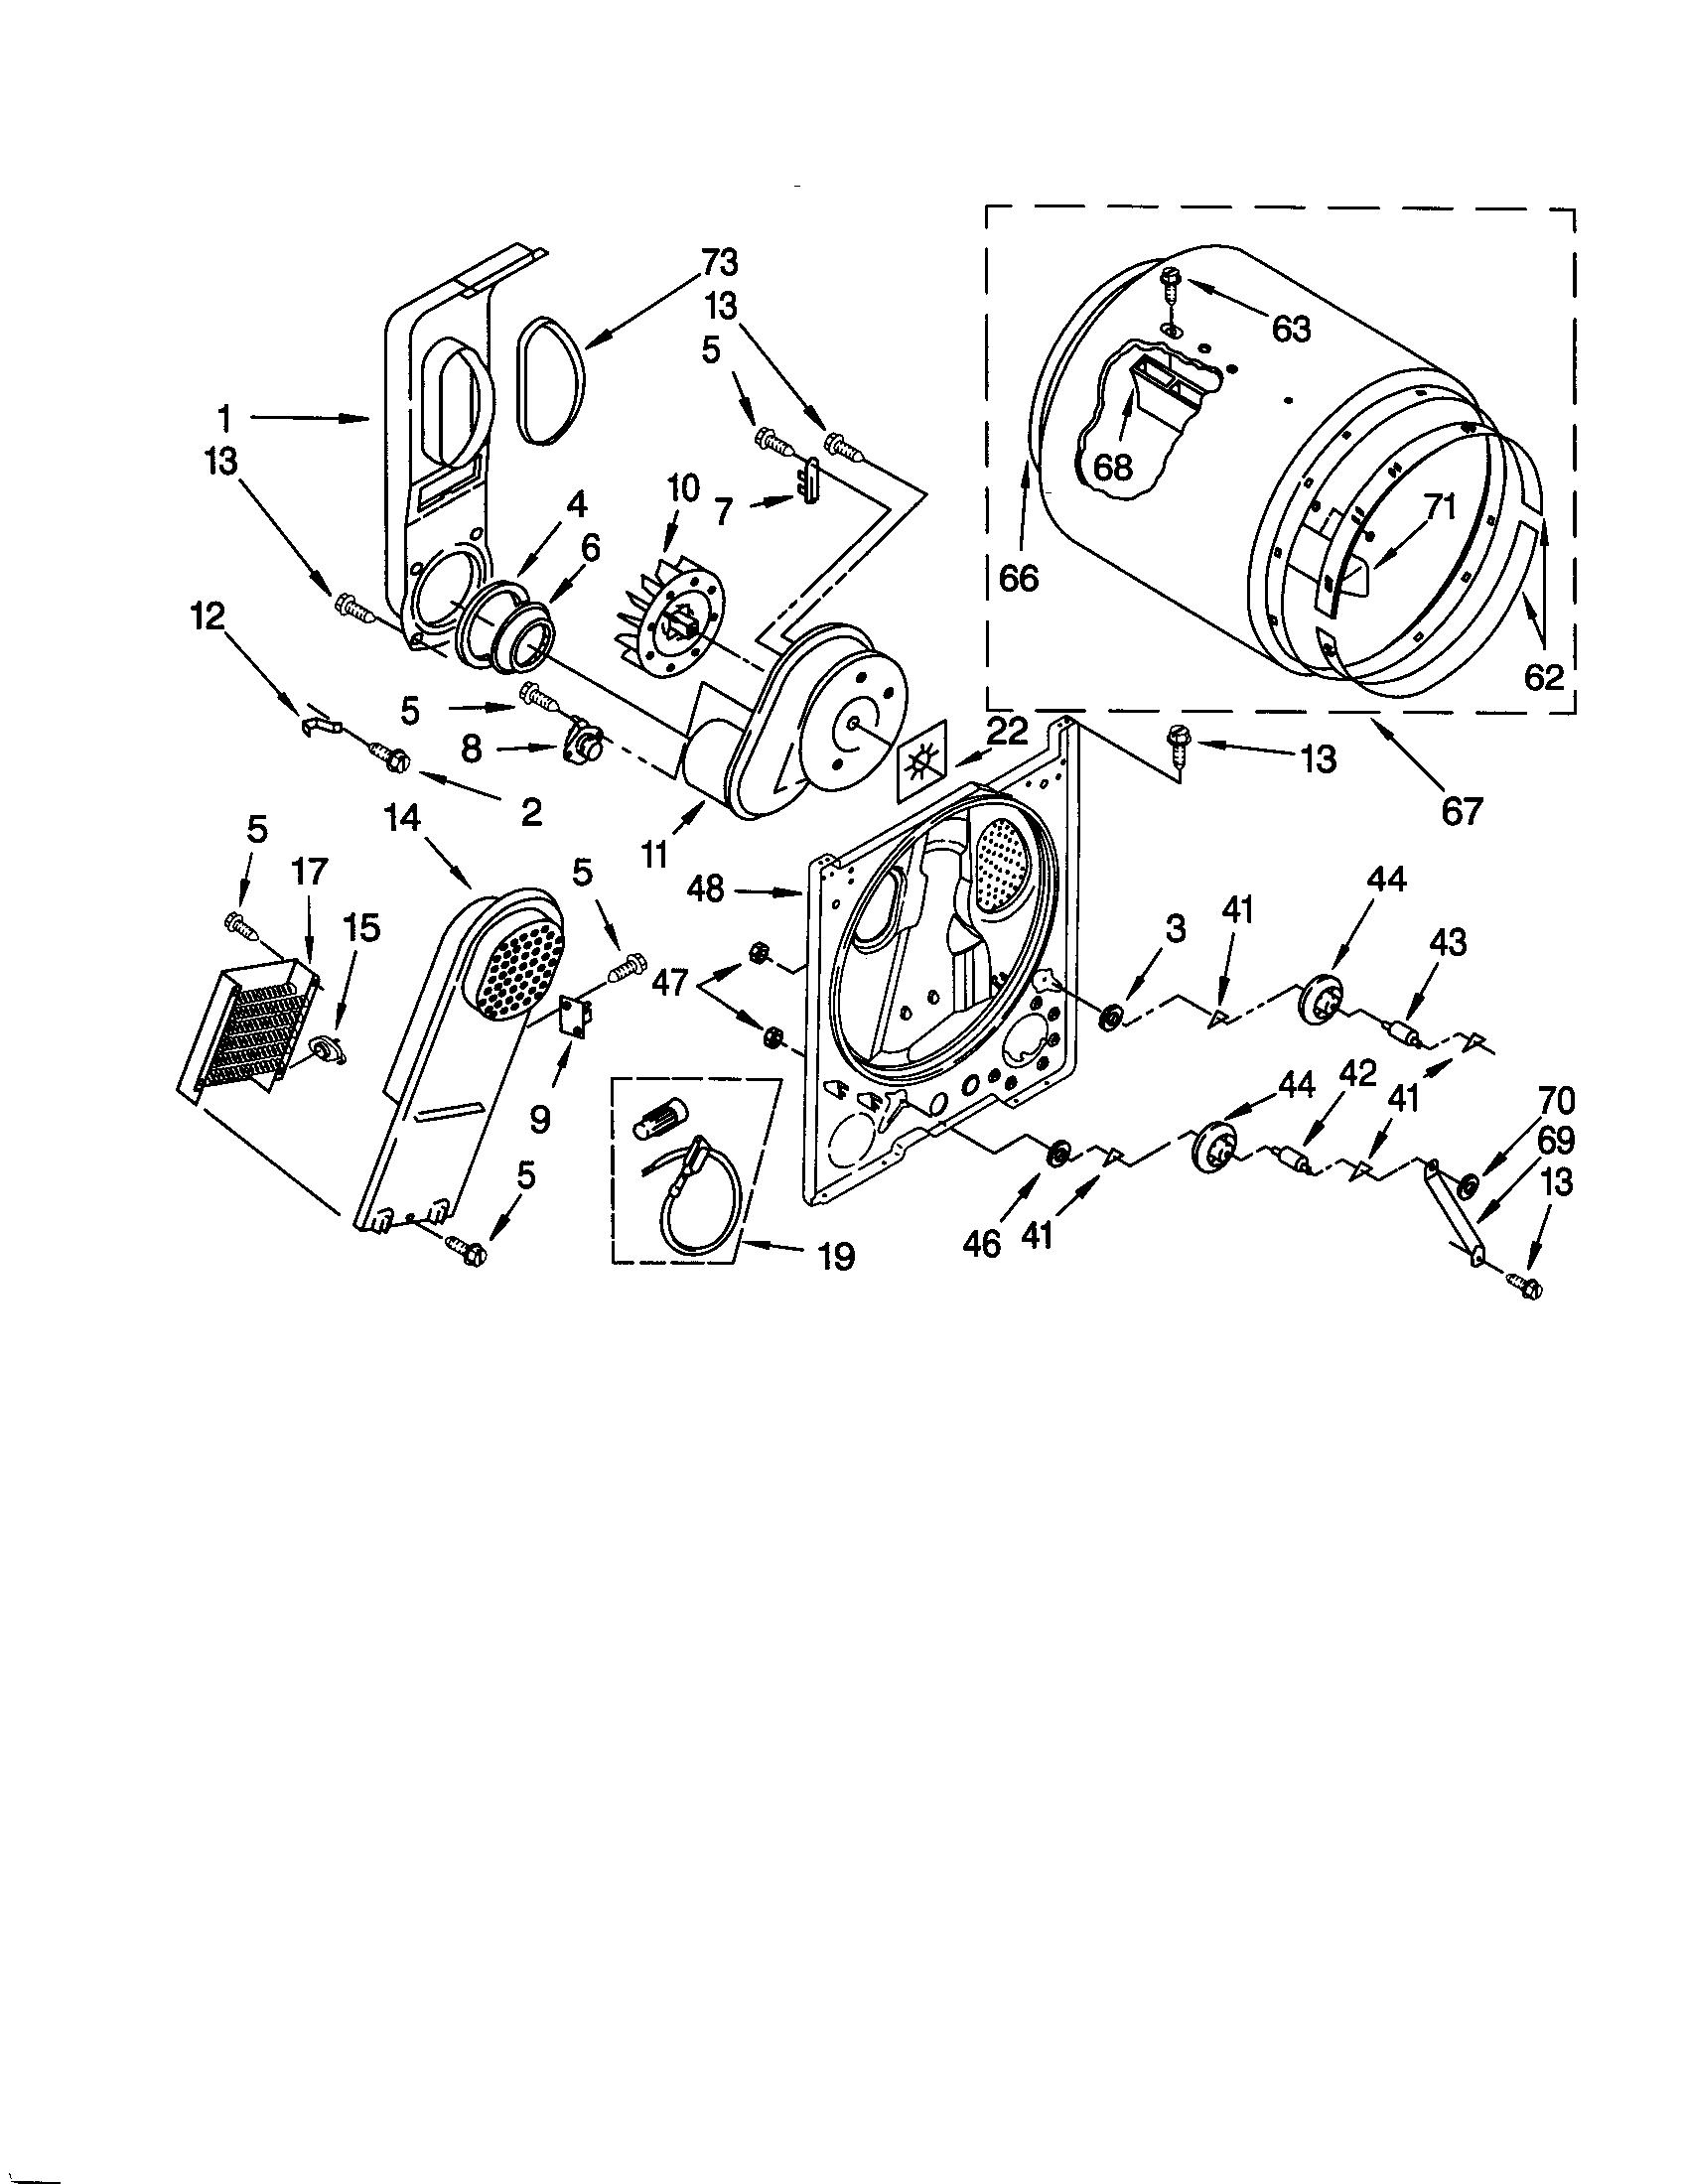 hight resolution of model wiring whirlpool diagram dryer ler7646aw2